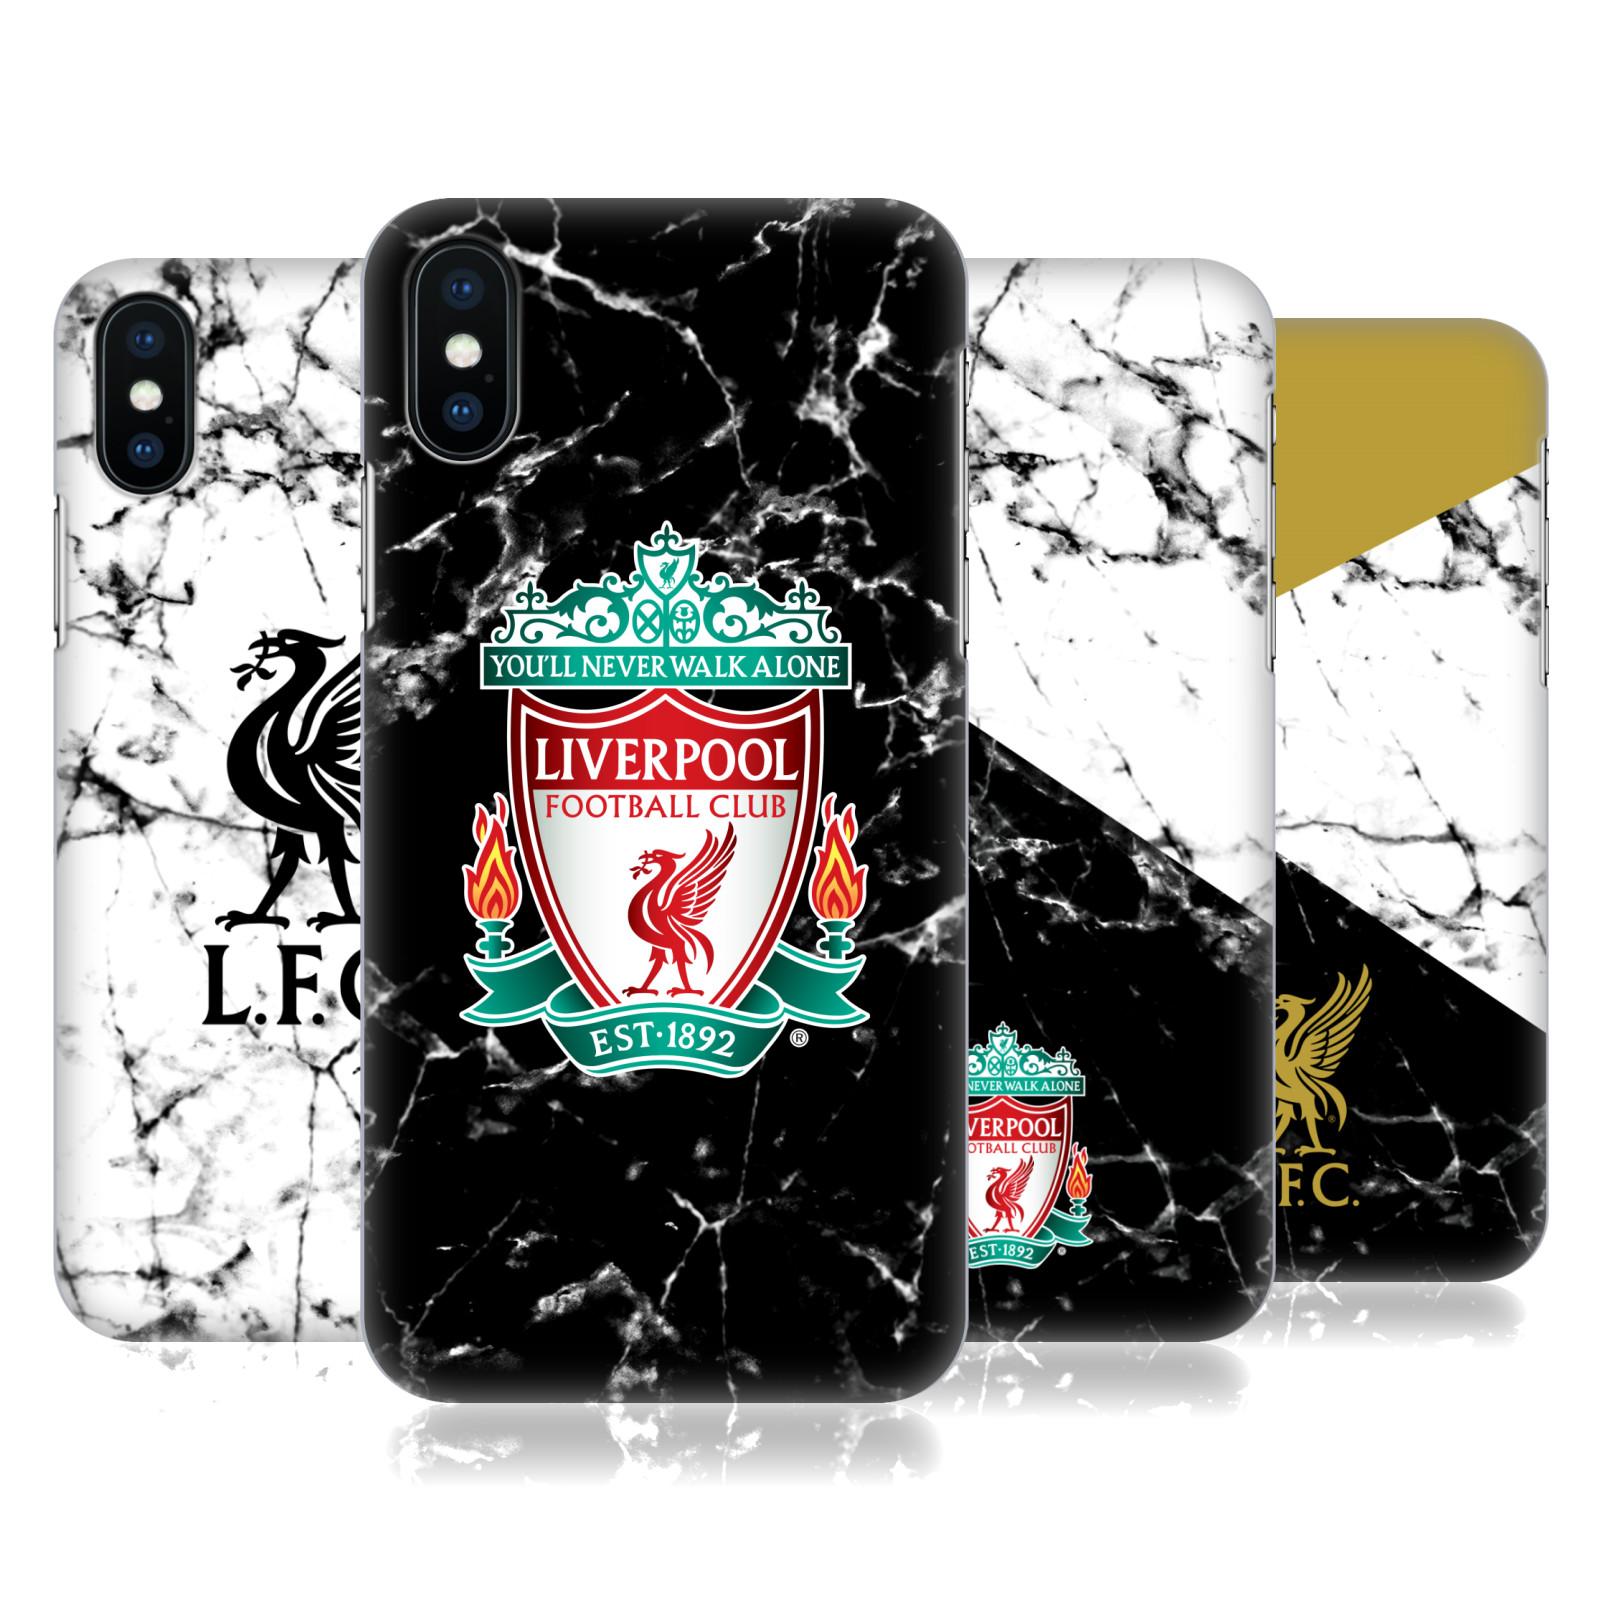 Liverpool Football Club 2017/18 Marble